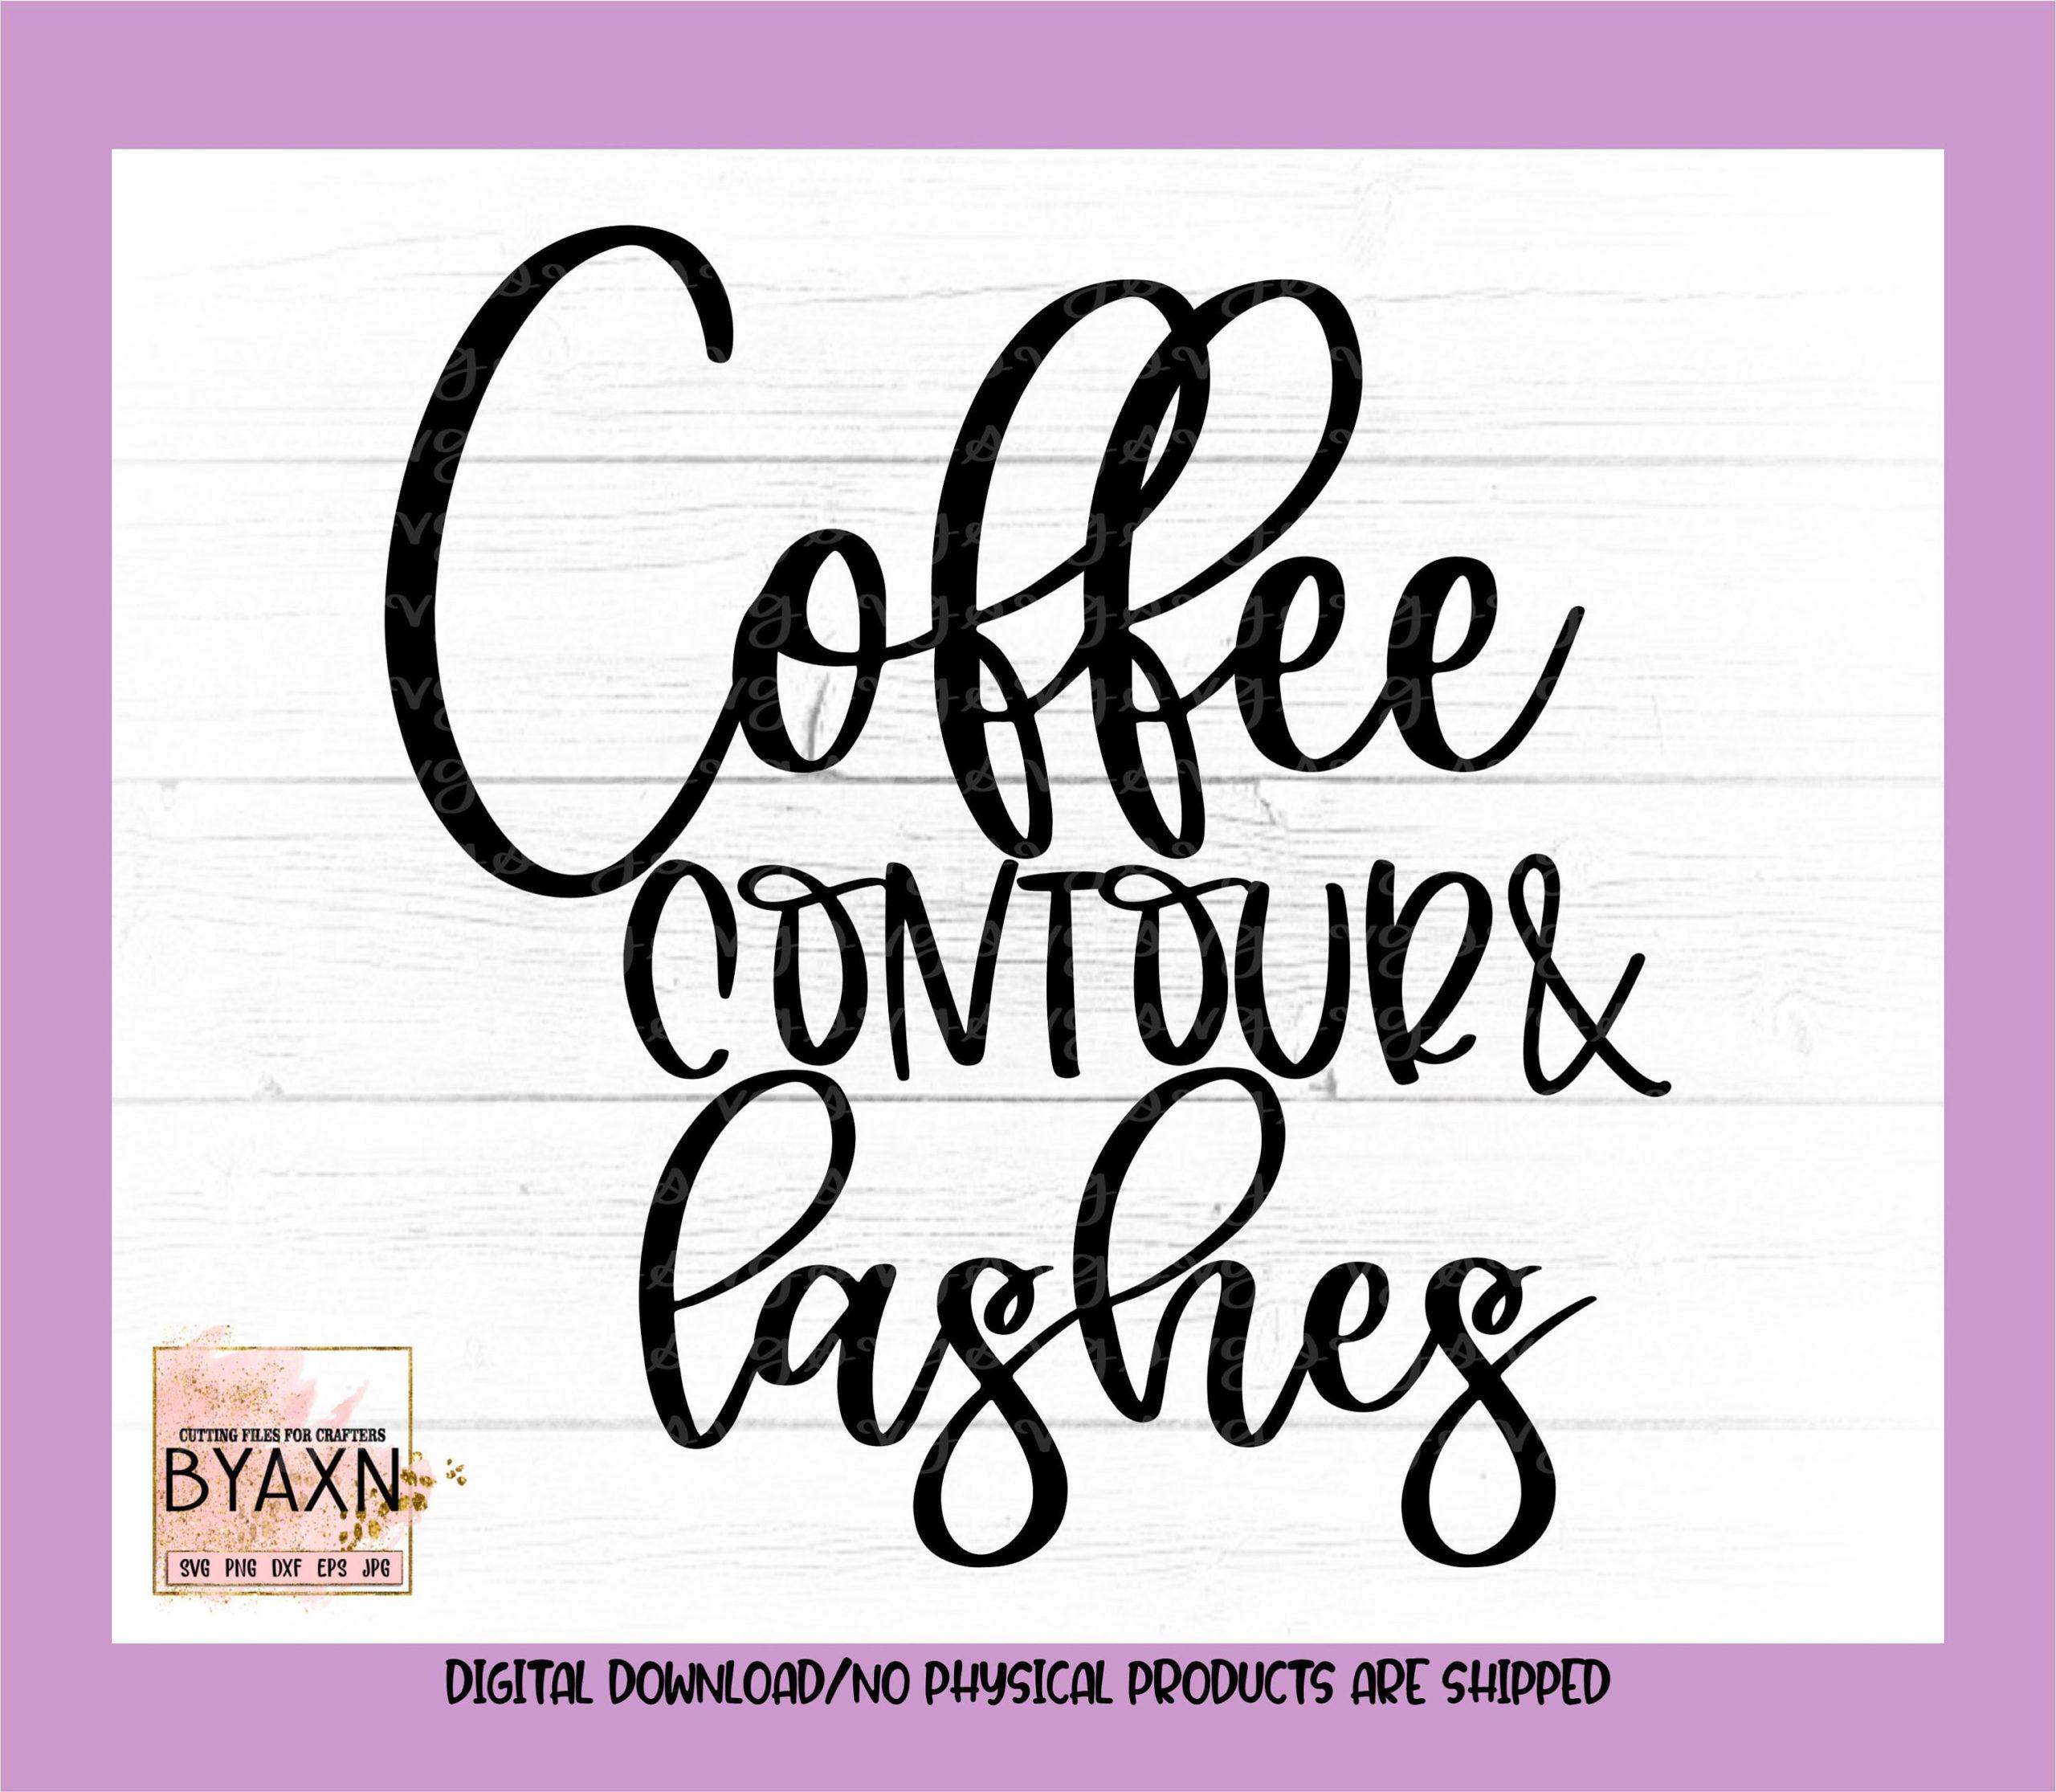 Make-up-svgcoffee-contour-lashes-svg-mascara-svg-lashes-svg-contour-svglash-svg-makeup-svg-designs-makeup-cut-file-cricut-svg-60514cf5